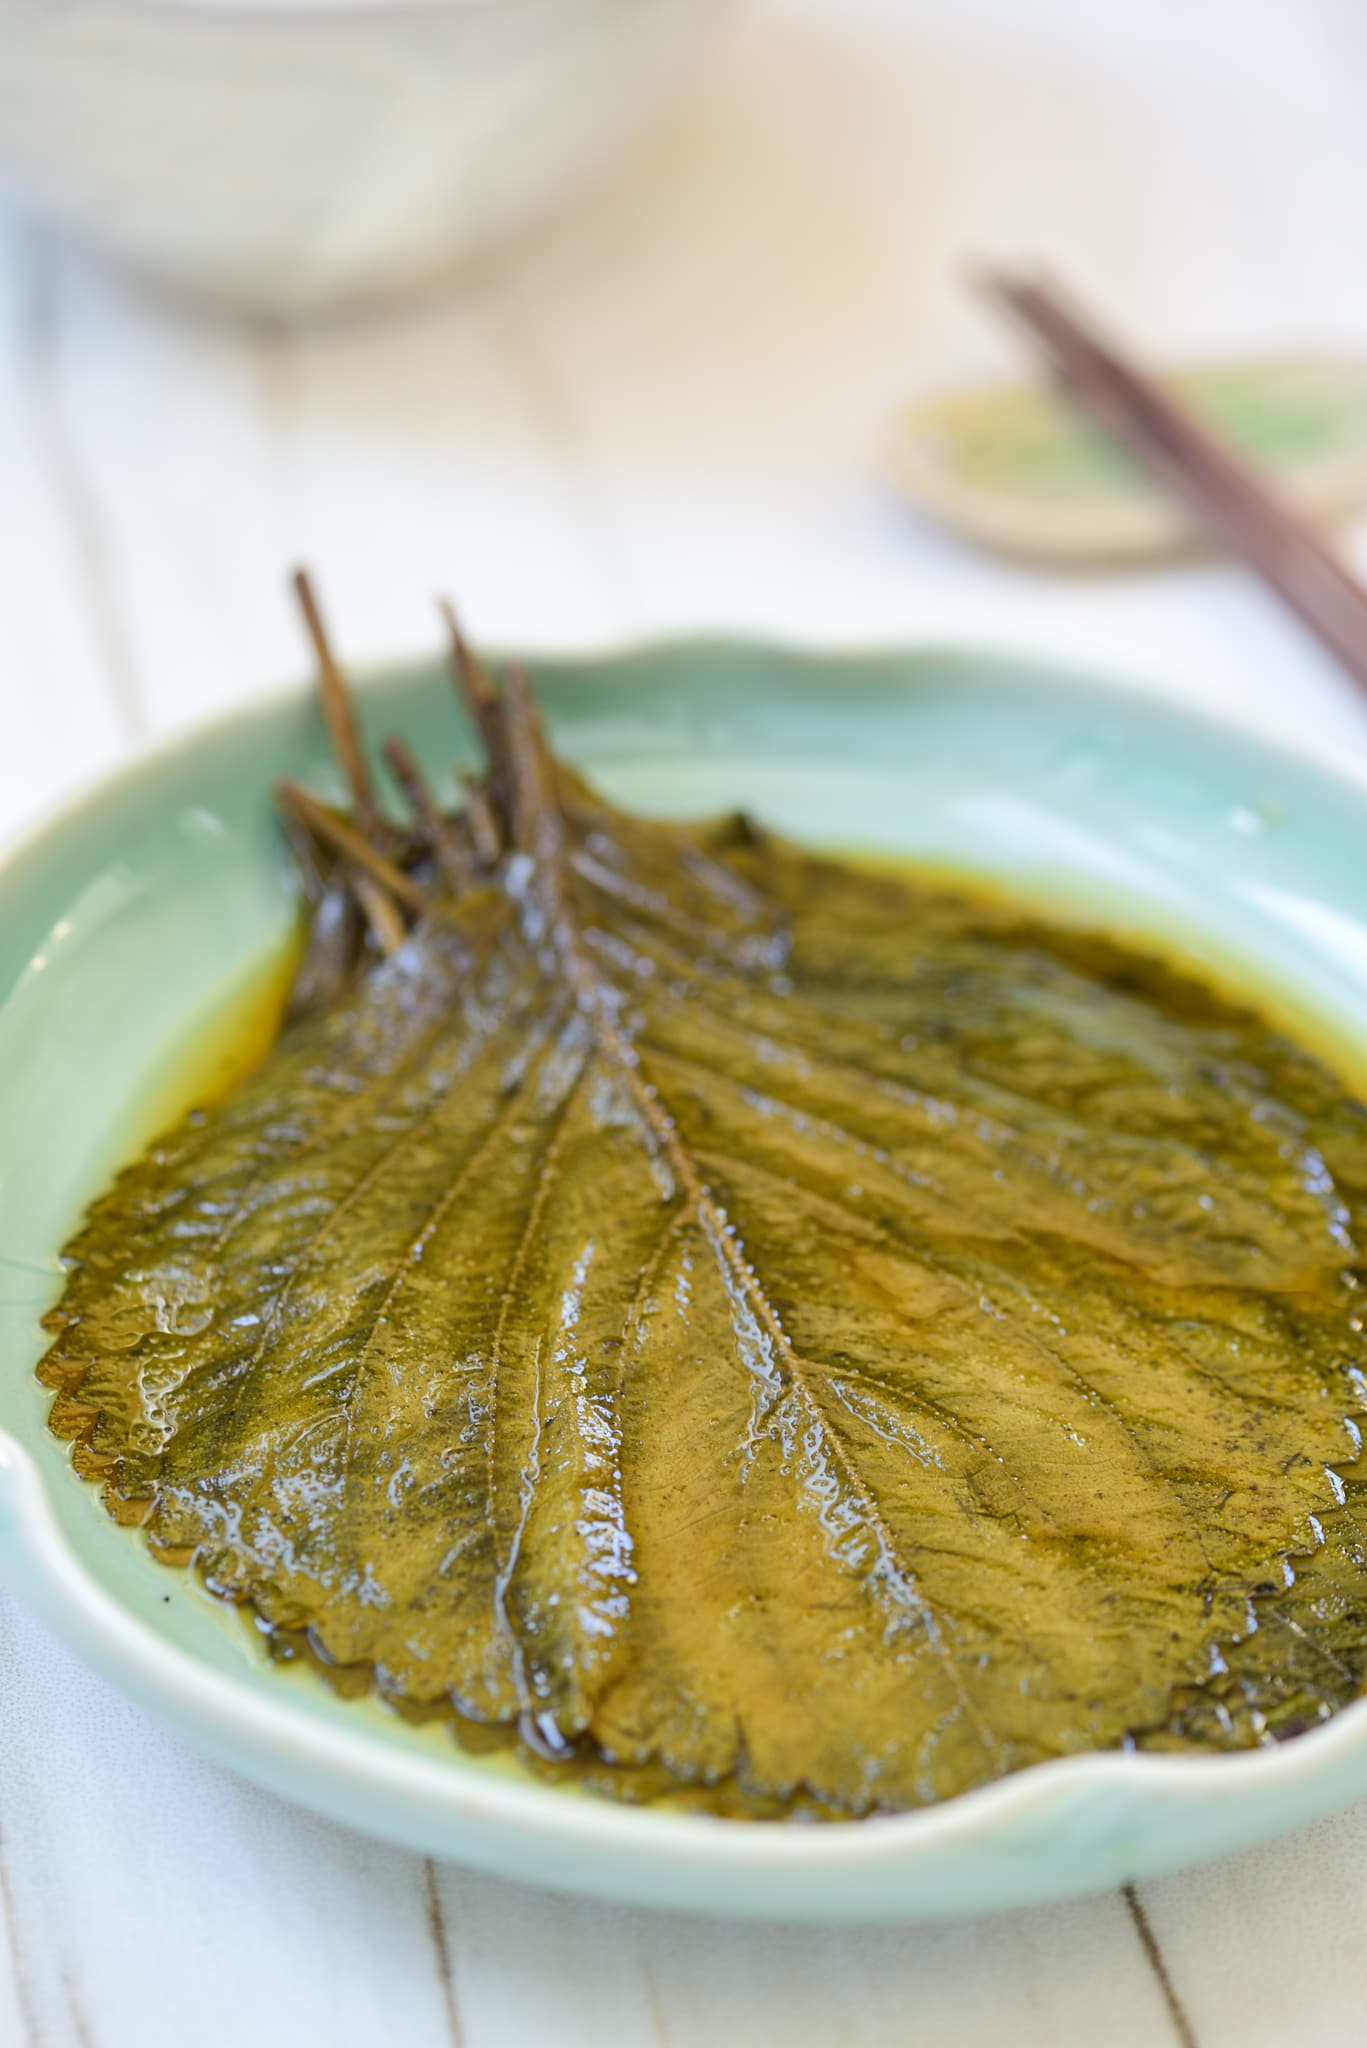 Korean pickled perilla leaves